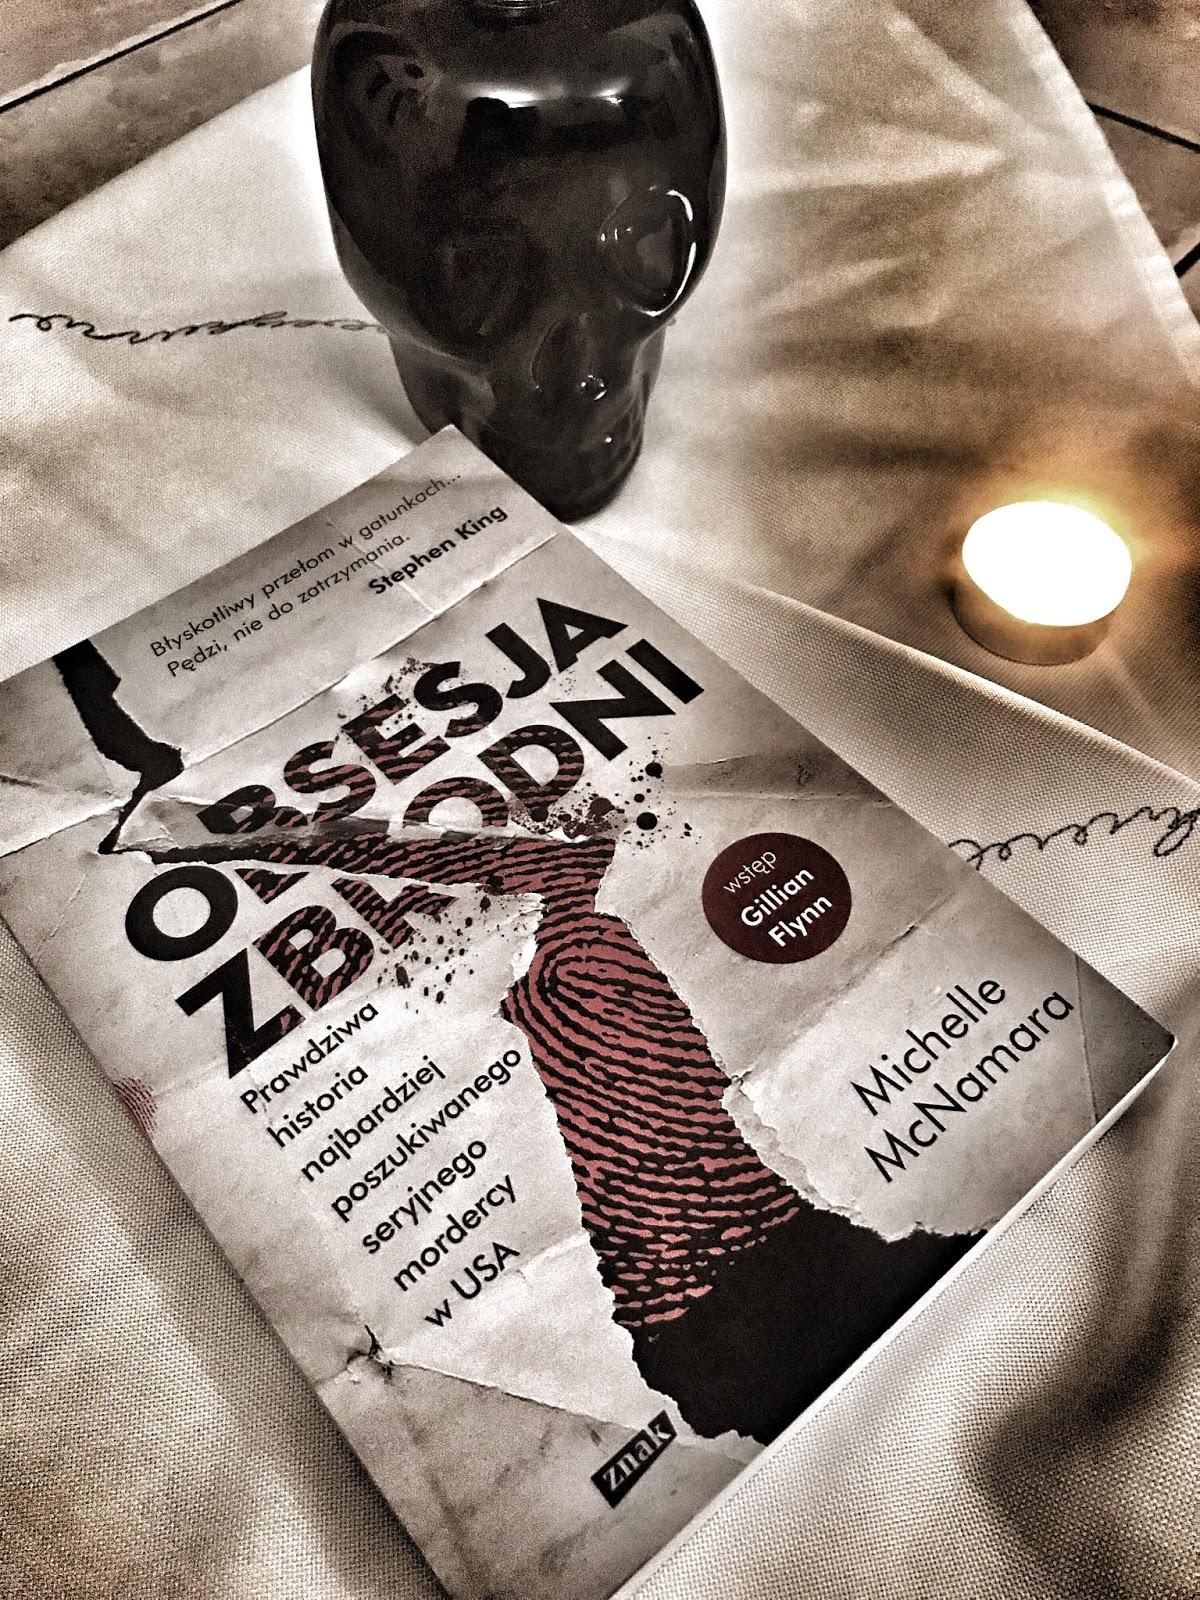 Michelle McNamara - Obsesja zbrodni